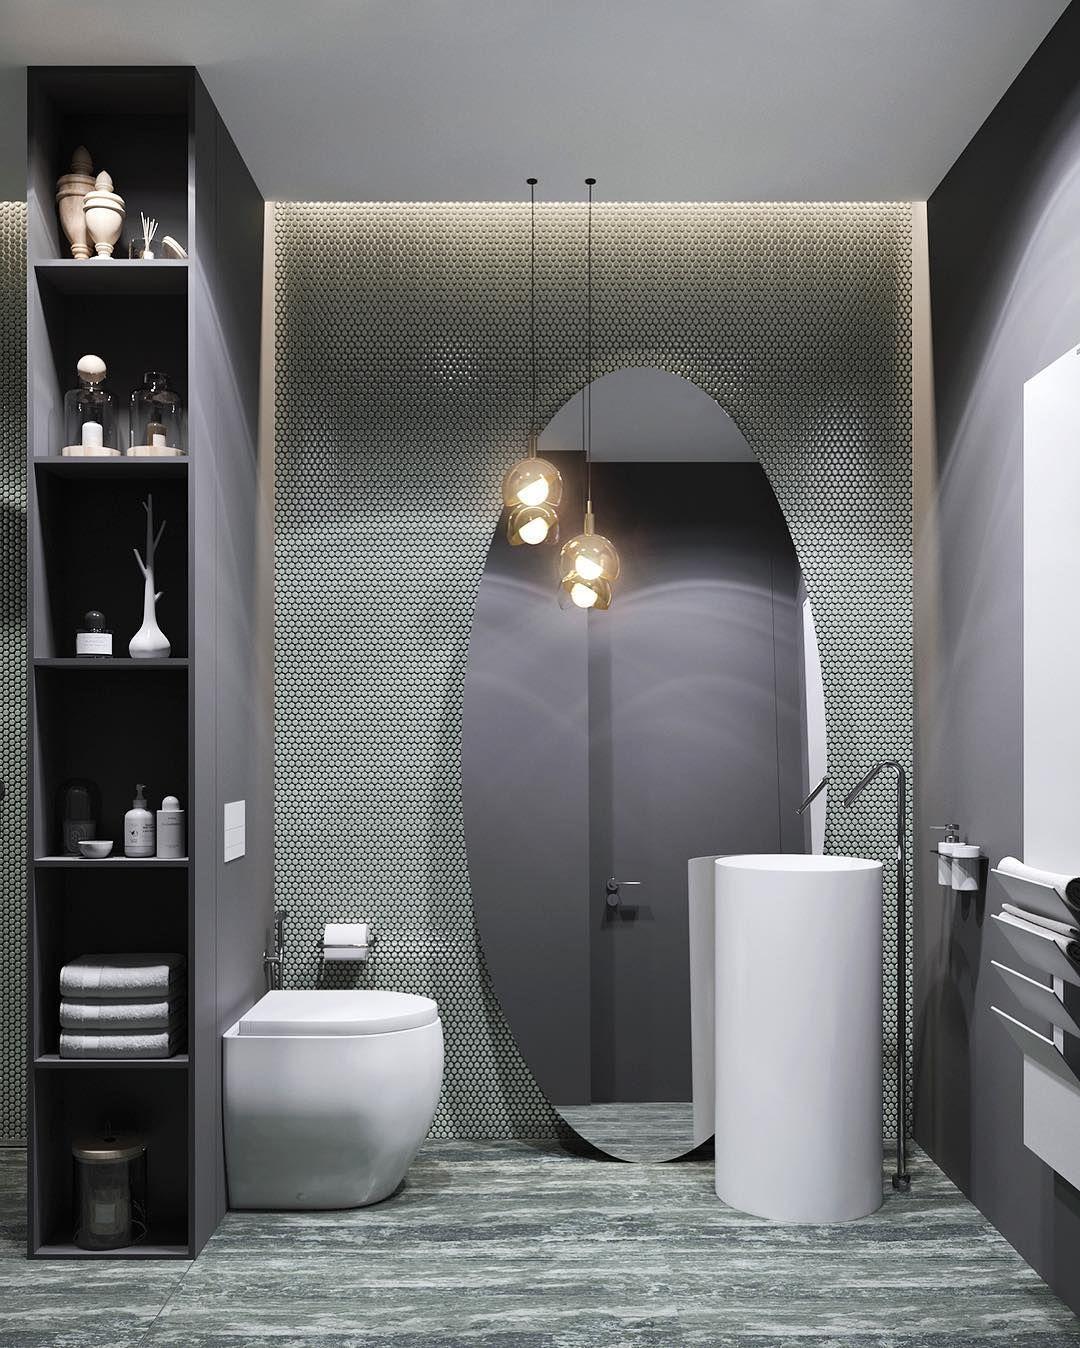 Luxury Bathroom Interior Design: 32 Modern Bathrooms That Make The Case For Luxury